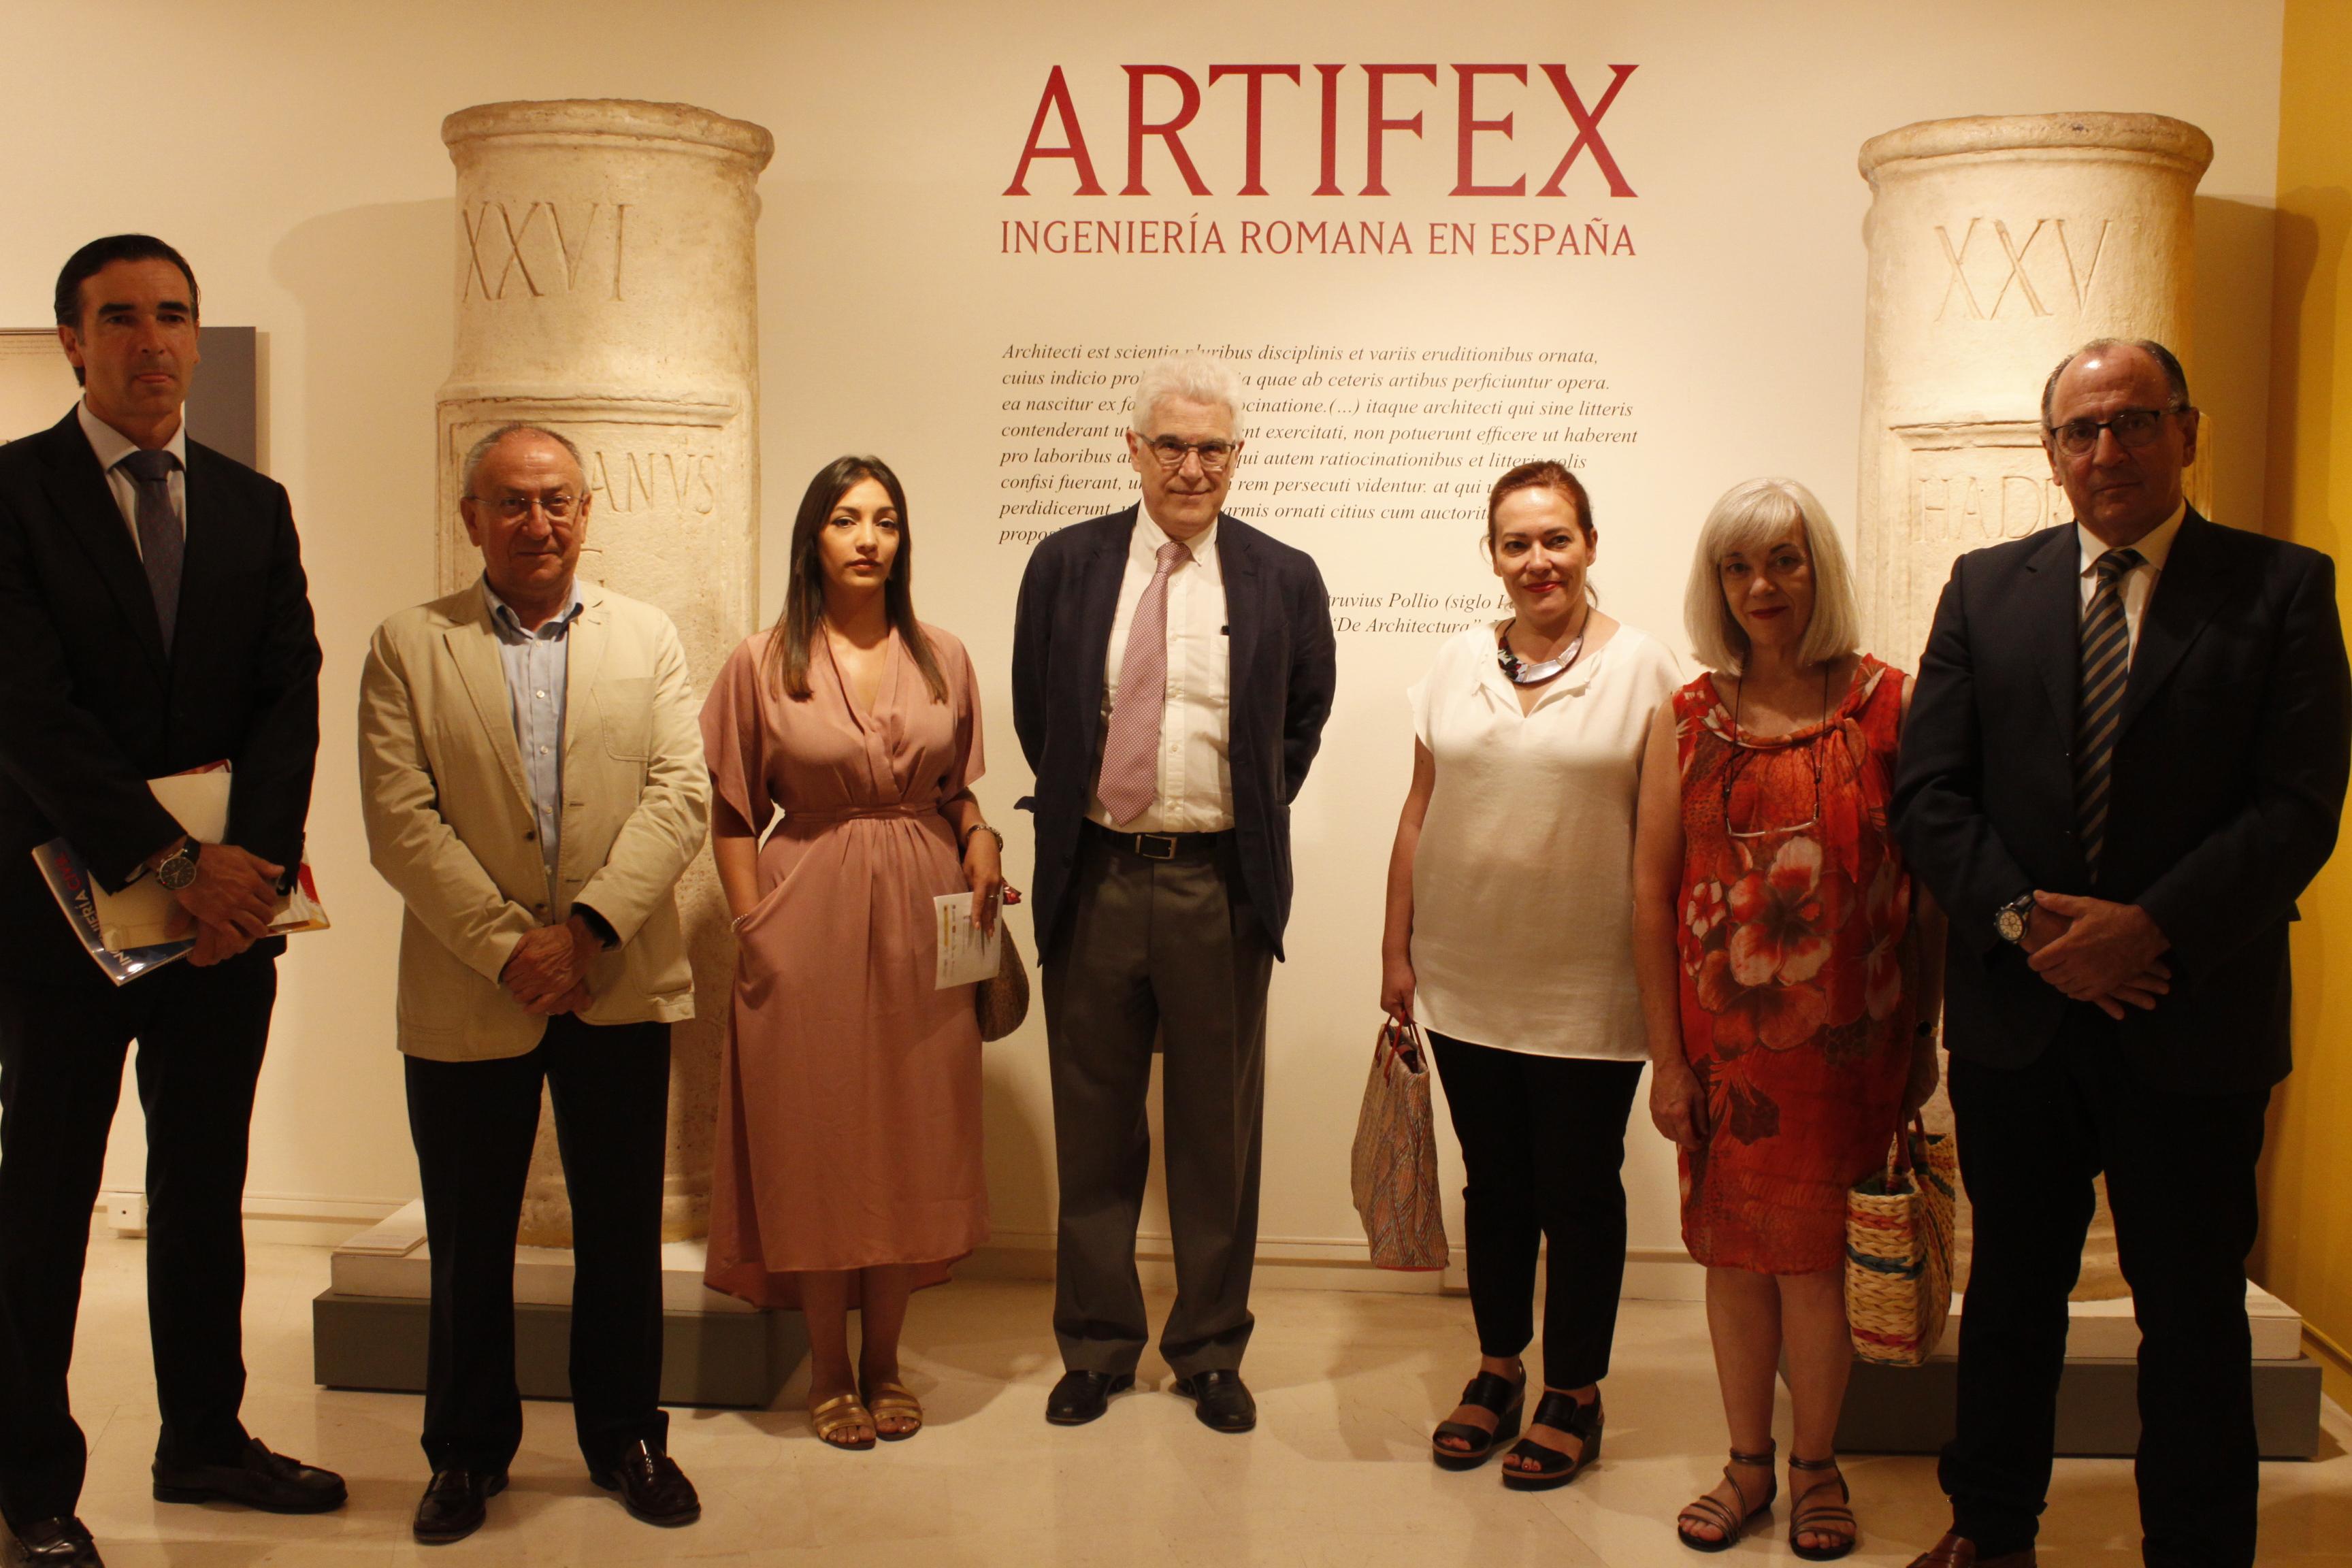 Inauguración de la exposición 'Artifex. Ingeniería romana en España'